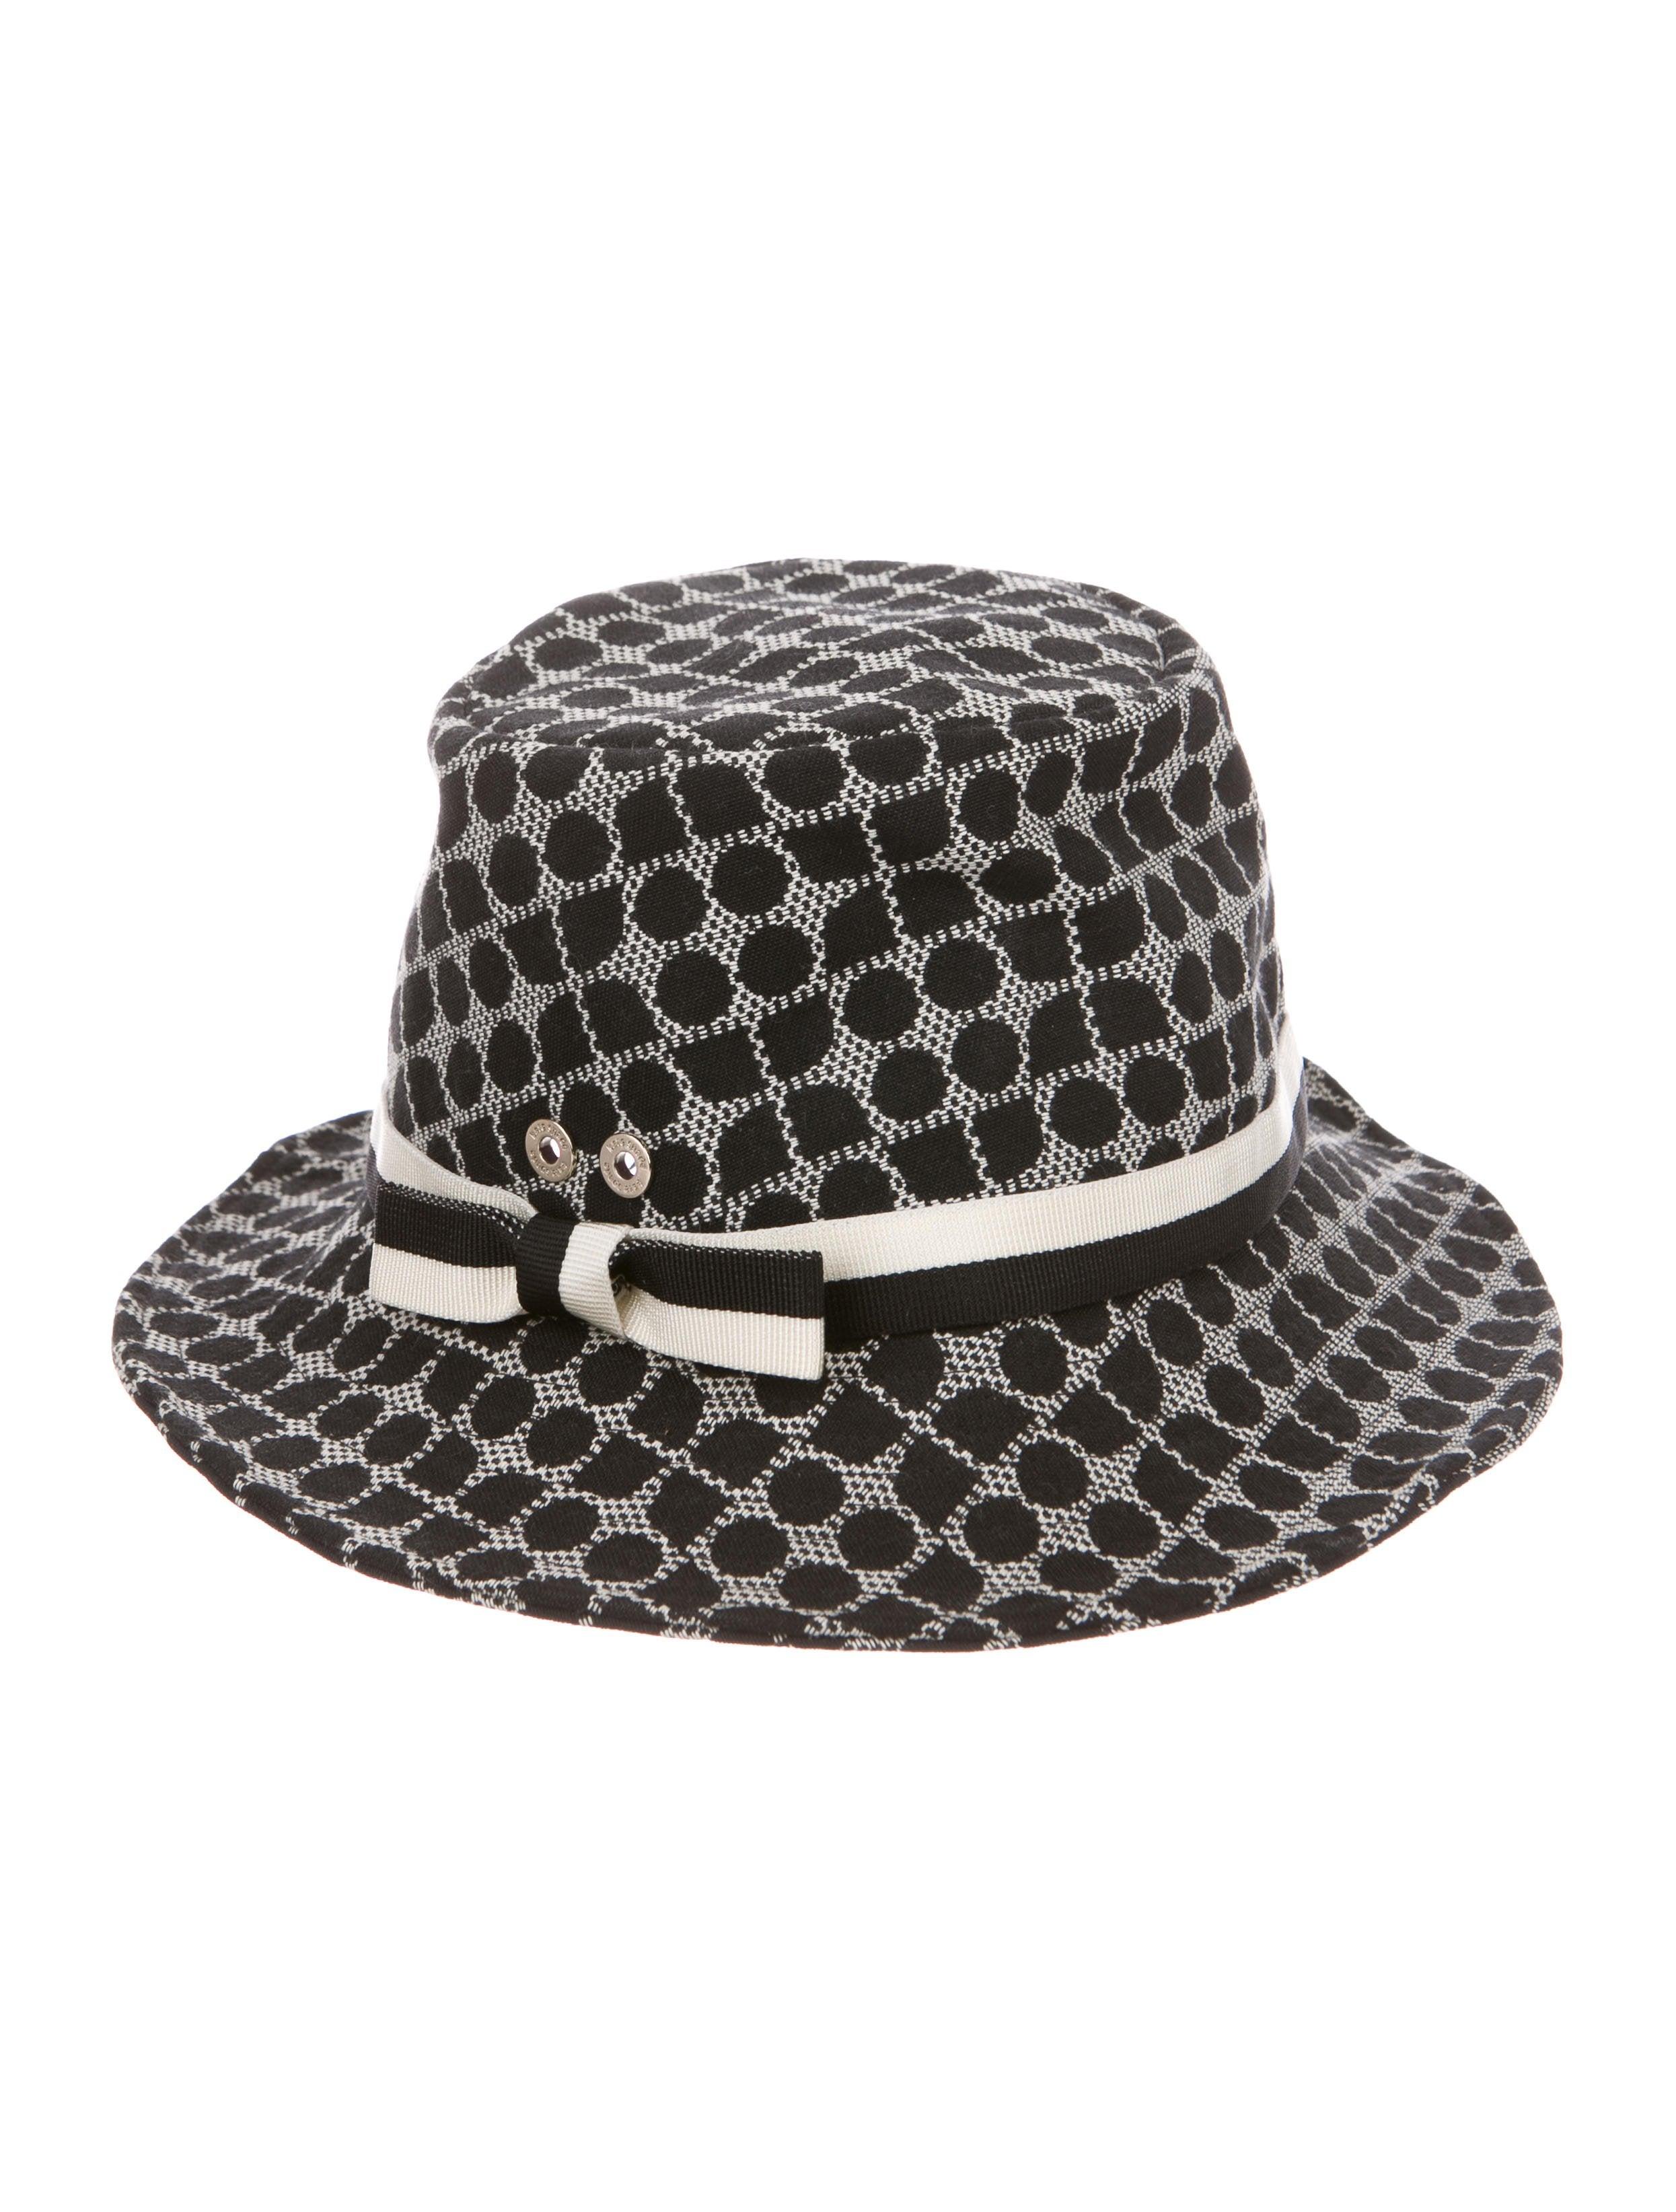 8bc3613e0f4 Kate Spade New York Woven Bucket Hat - Accessories - WKA84142